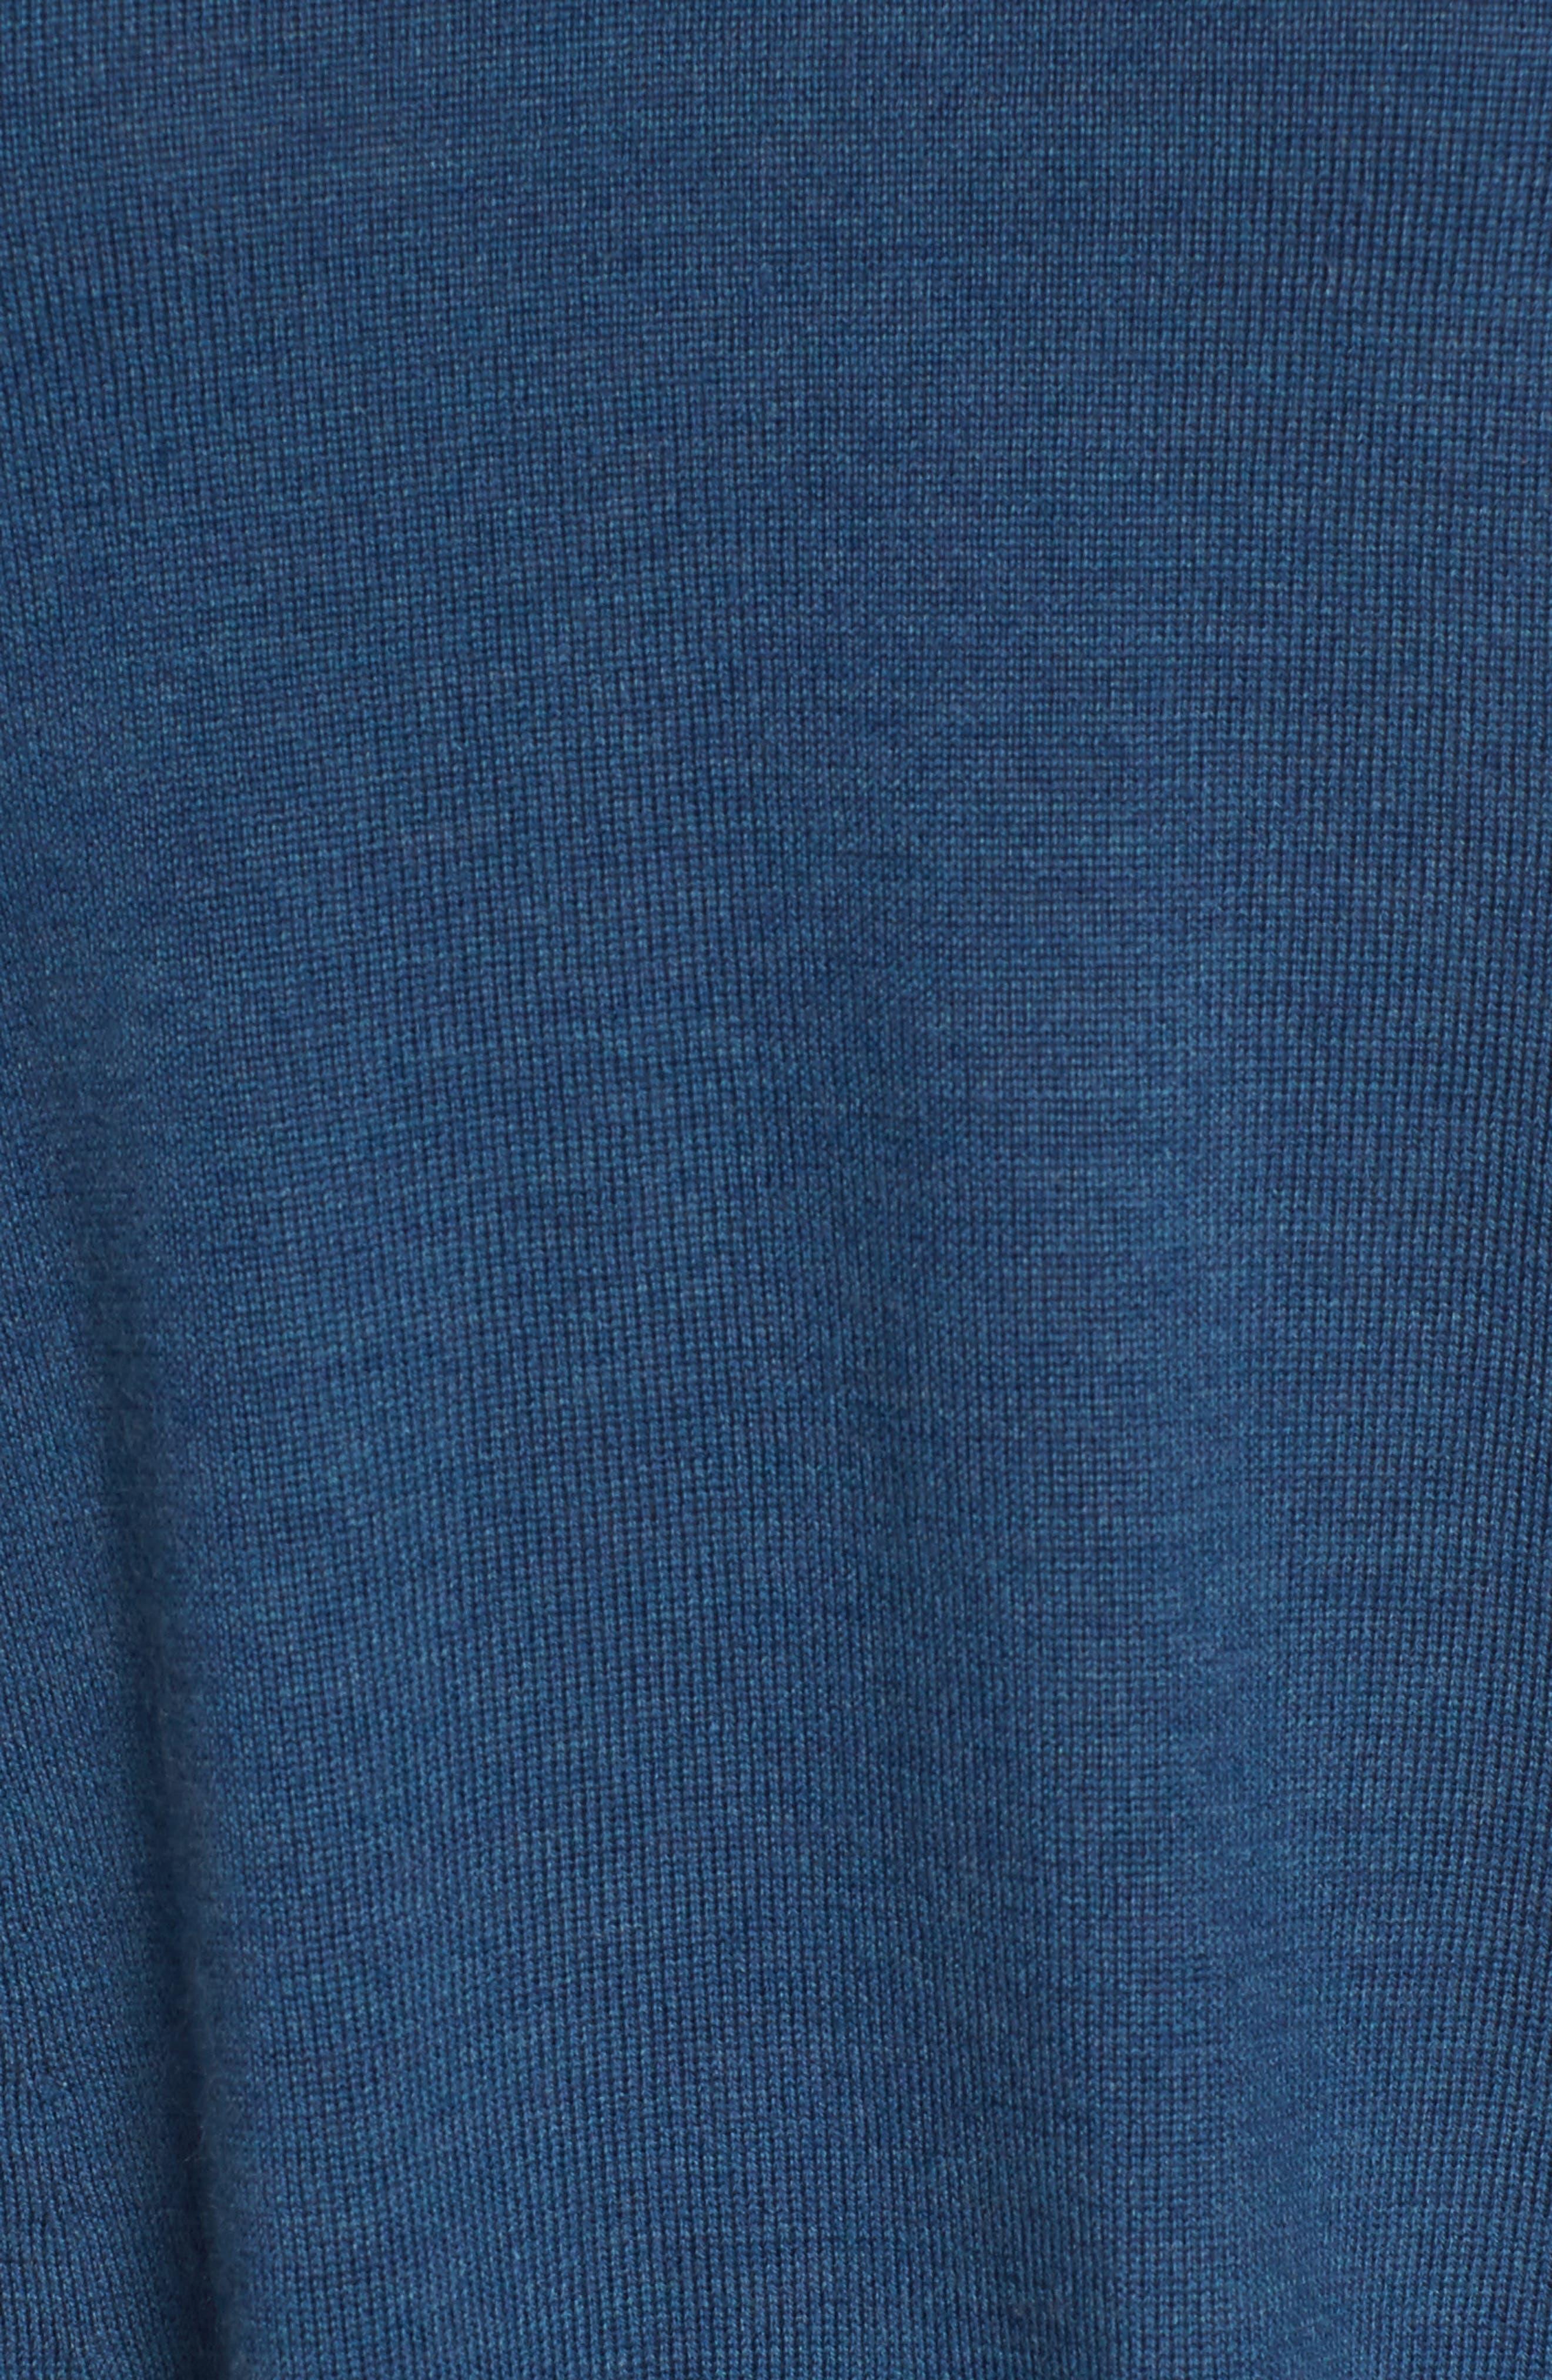 Alternate Image 5  - Eileen Fisher Lightweight Merino Jersey V-Neck Tunic (Regular & Petite)